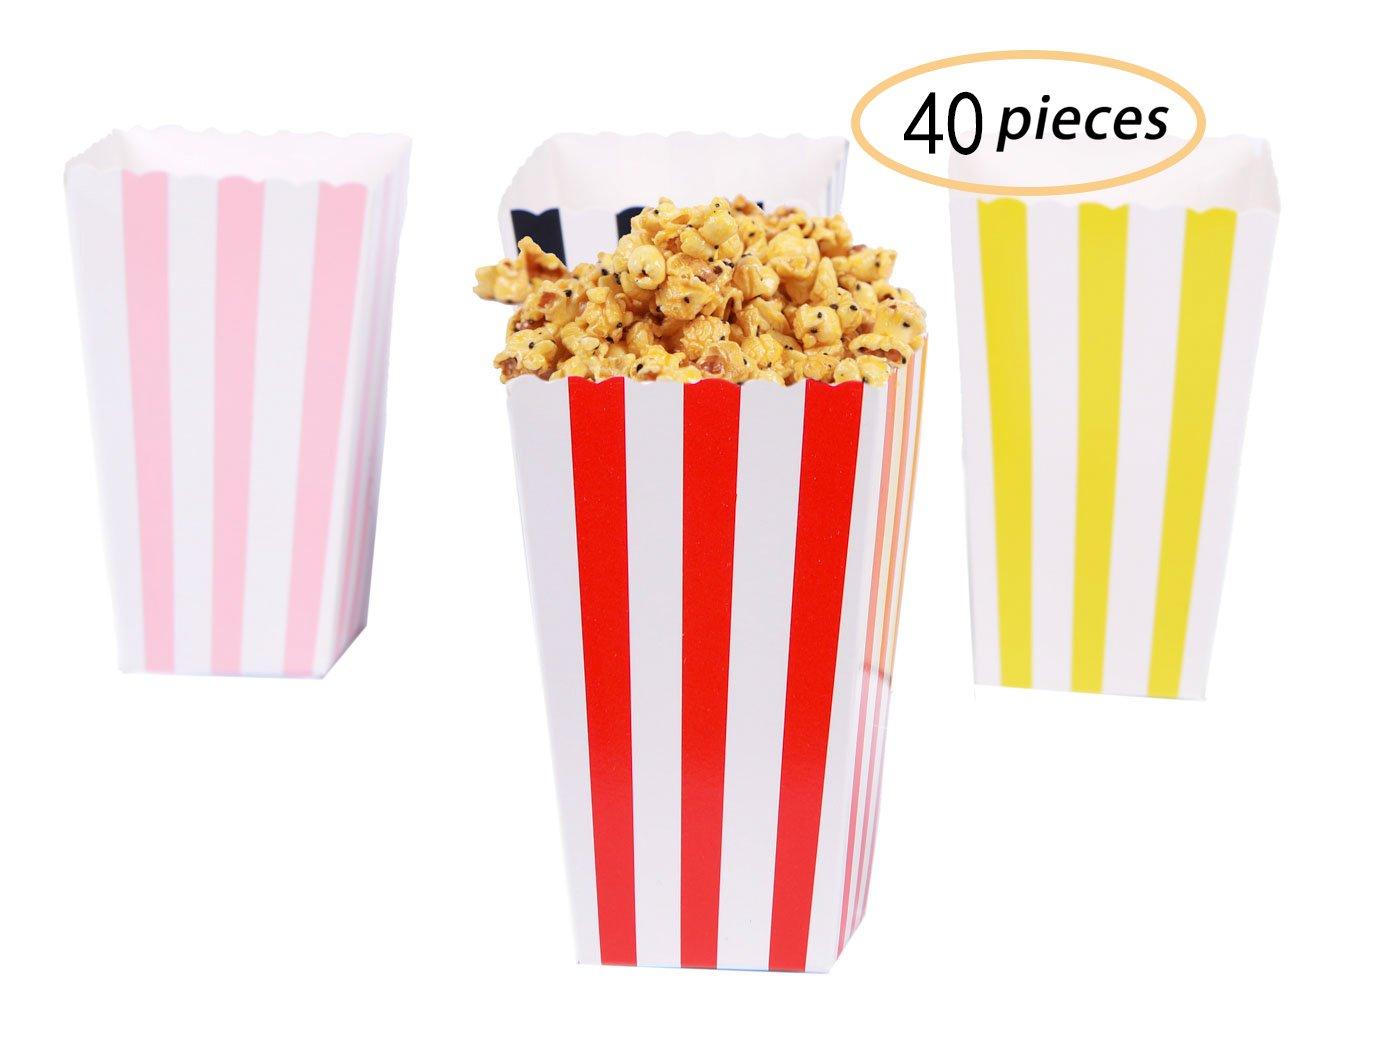 Yolito 40 pcs Mini Palomita Cajas Bolsas para Palomitas para Noche de Película, Picnic, Barbacoa, Favor de Fiesta (4 colores): Amazon.es: Hogar